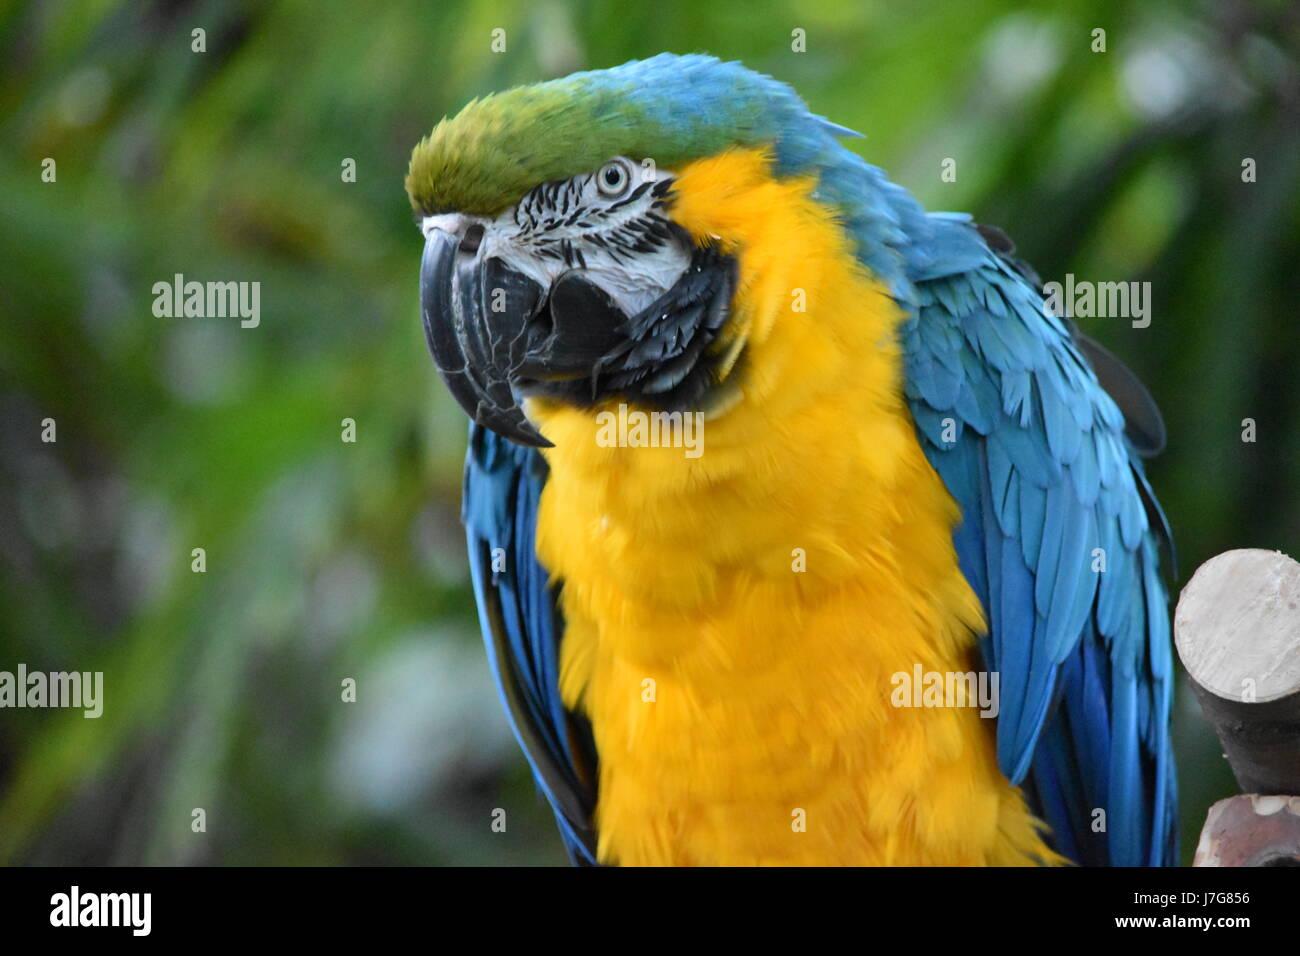 Coloridas aves Guacamayo Imagen De Stock